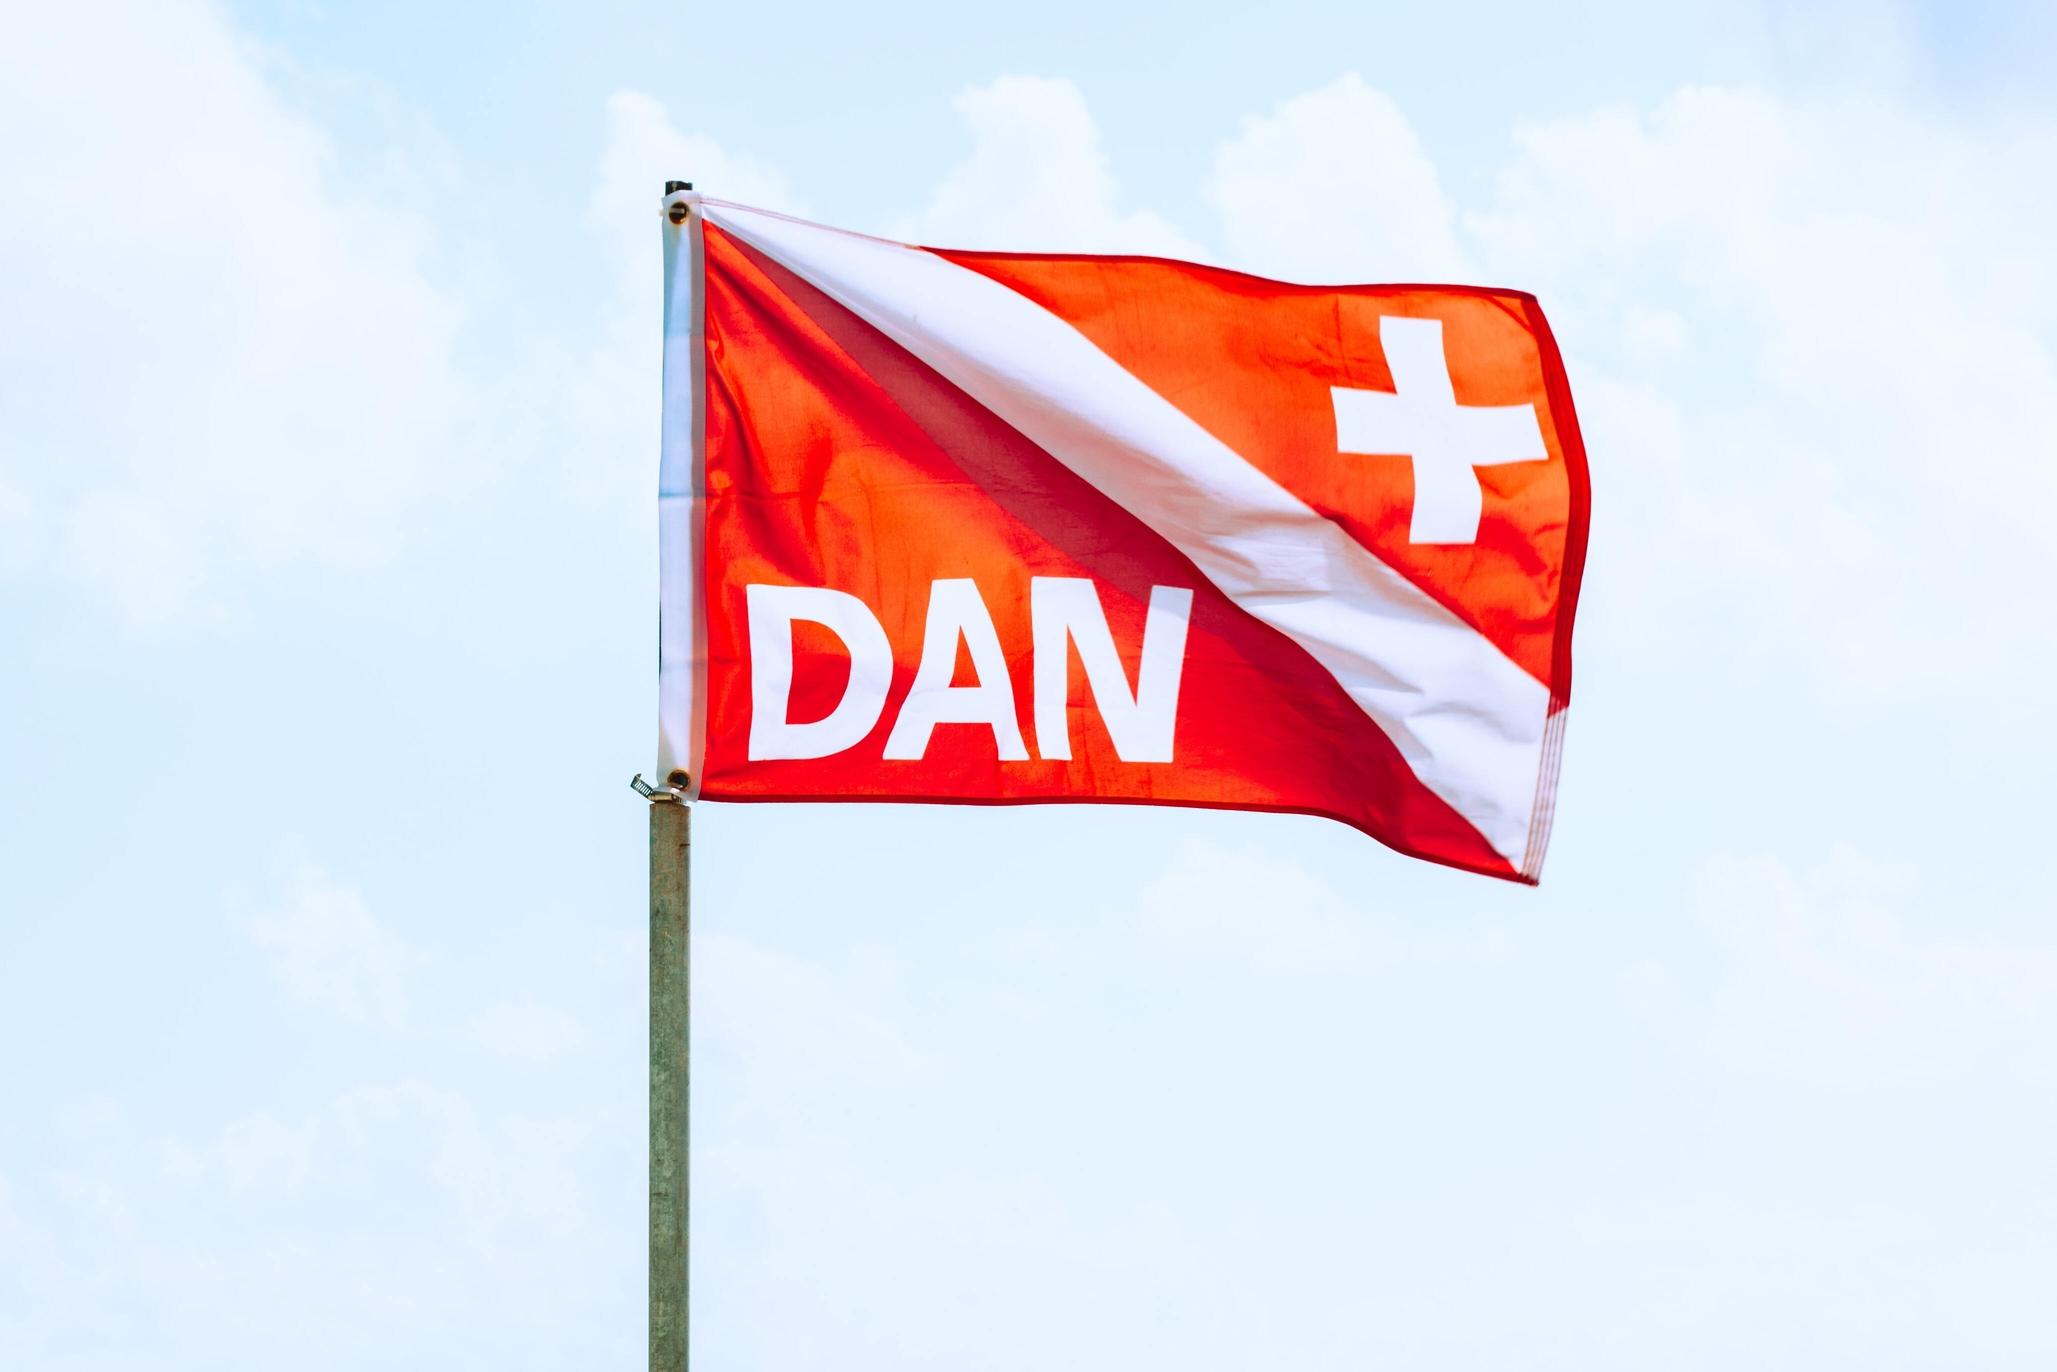 A flag of the scuba diving insurance company DAN on the beach